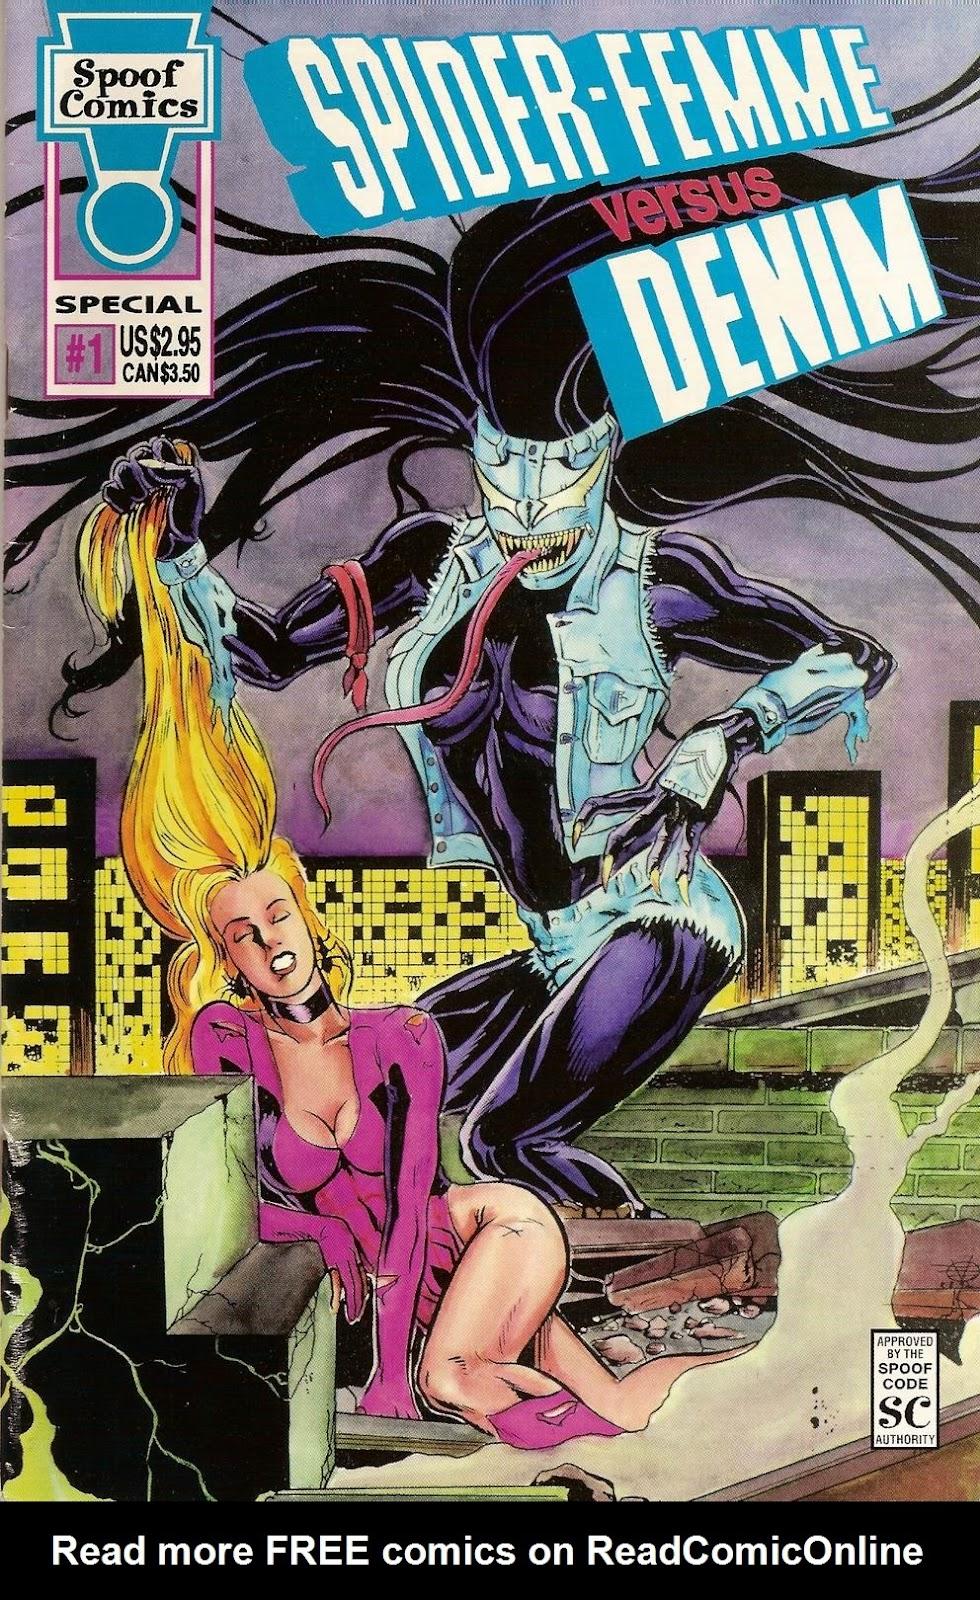 Spider Femme Versus Denim Full Page 1